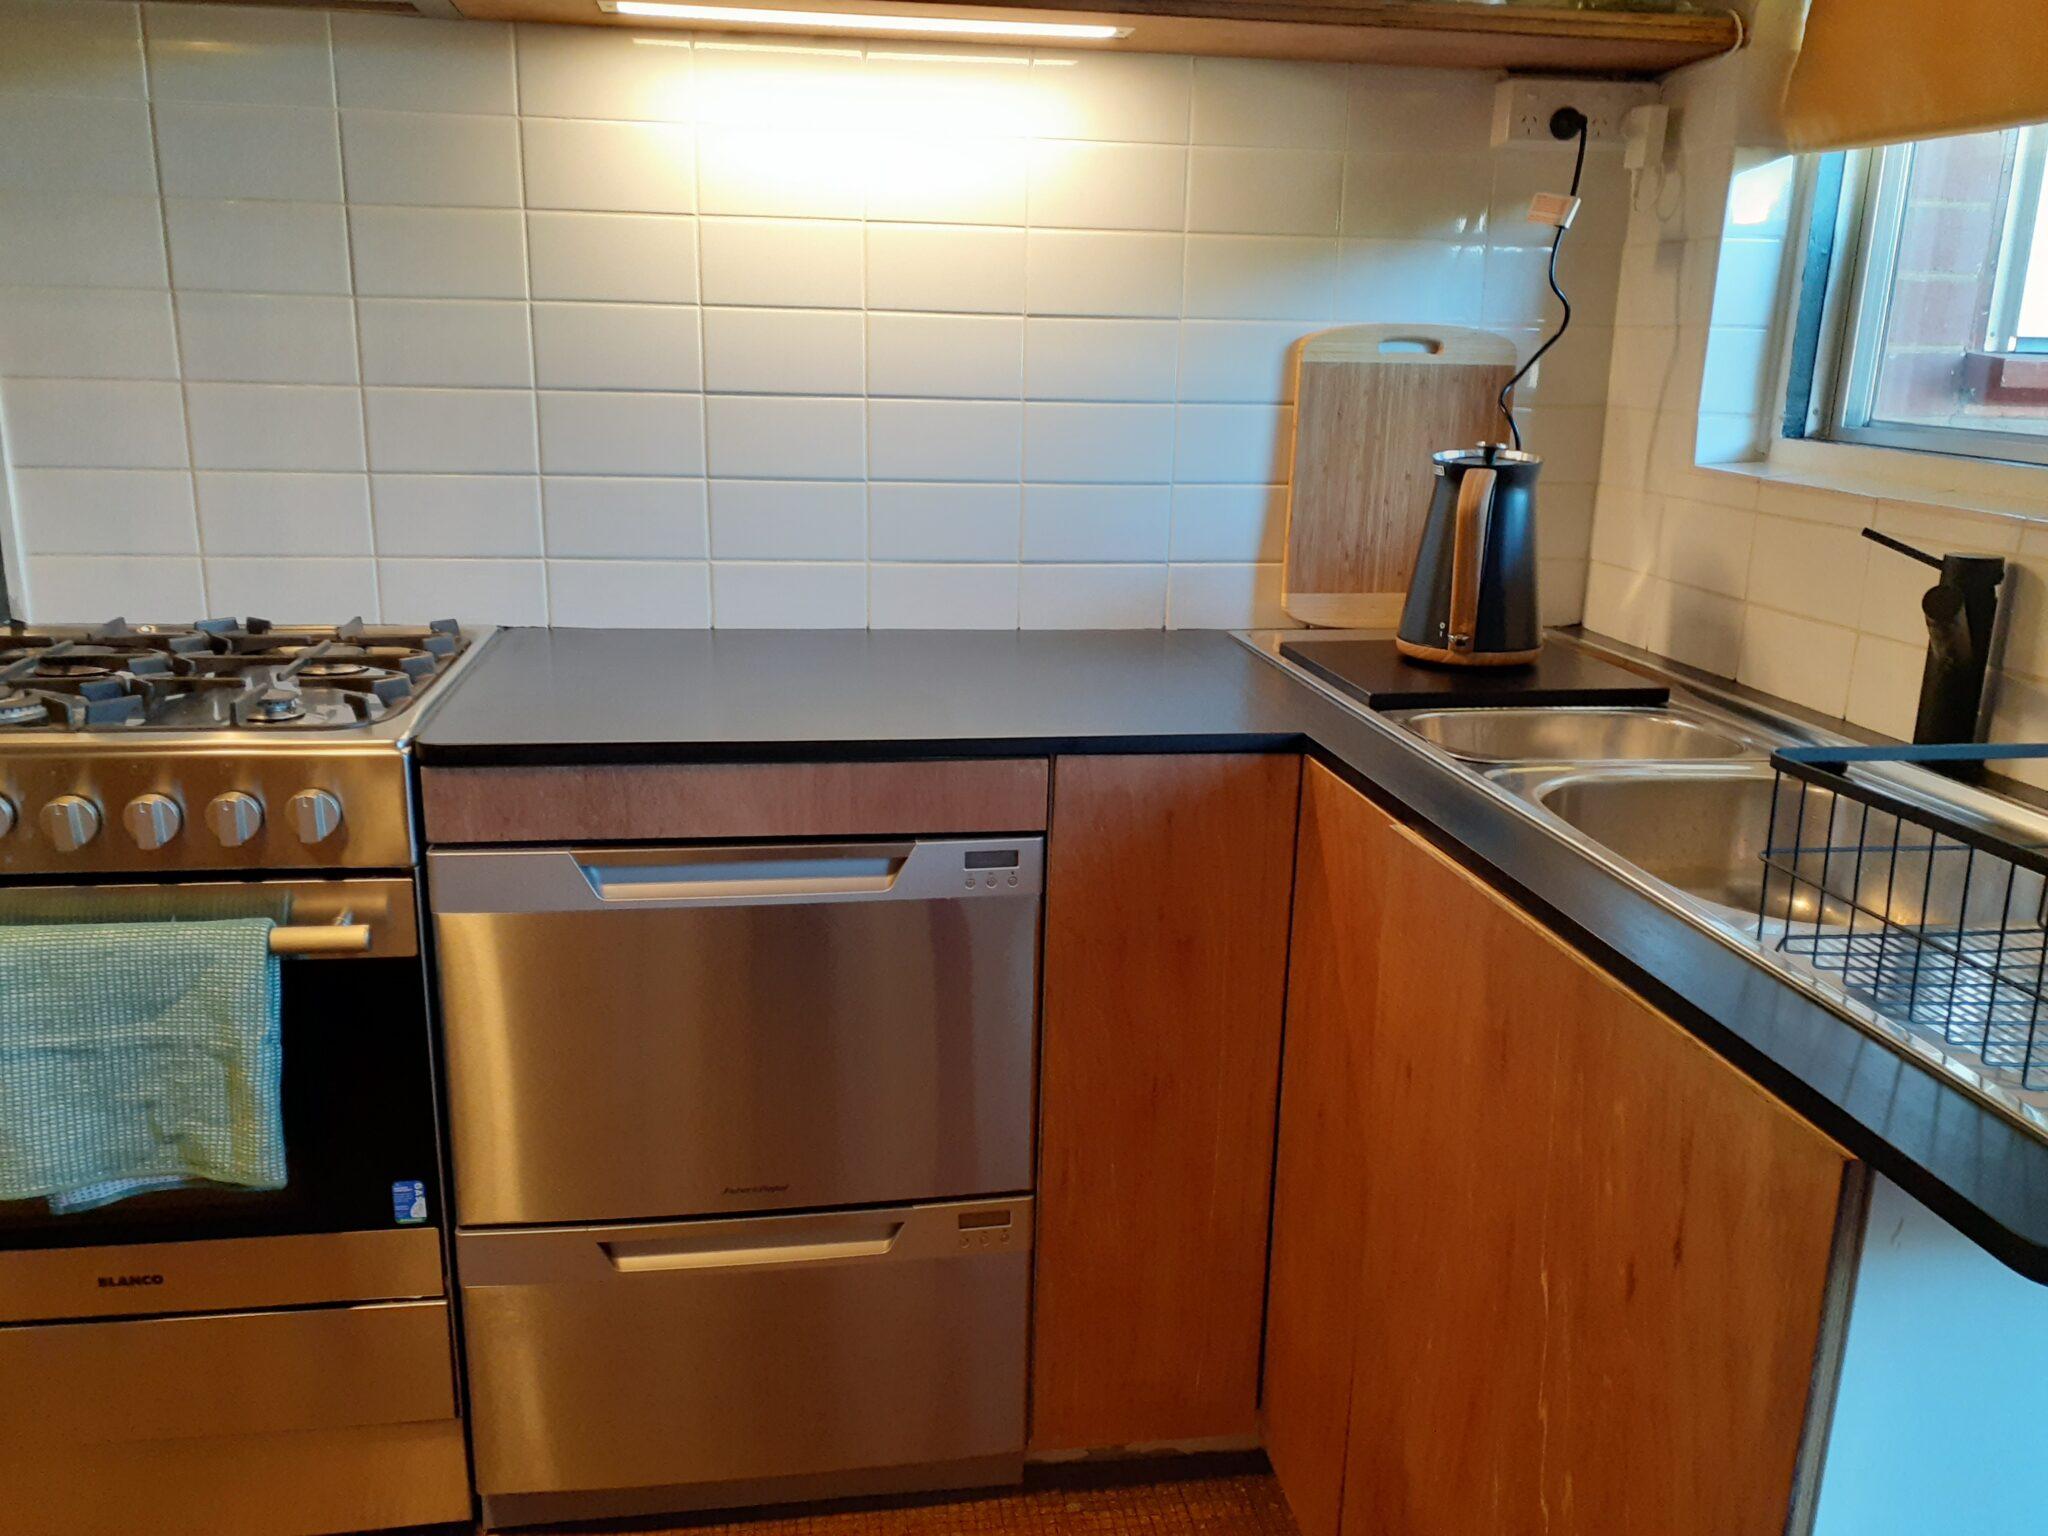 double drawer dishwasher in the Salon at Sevenoaks